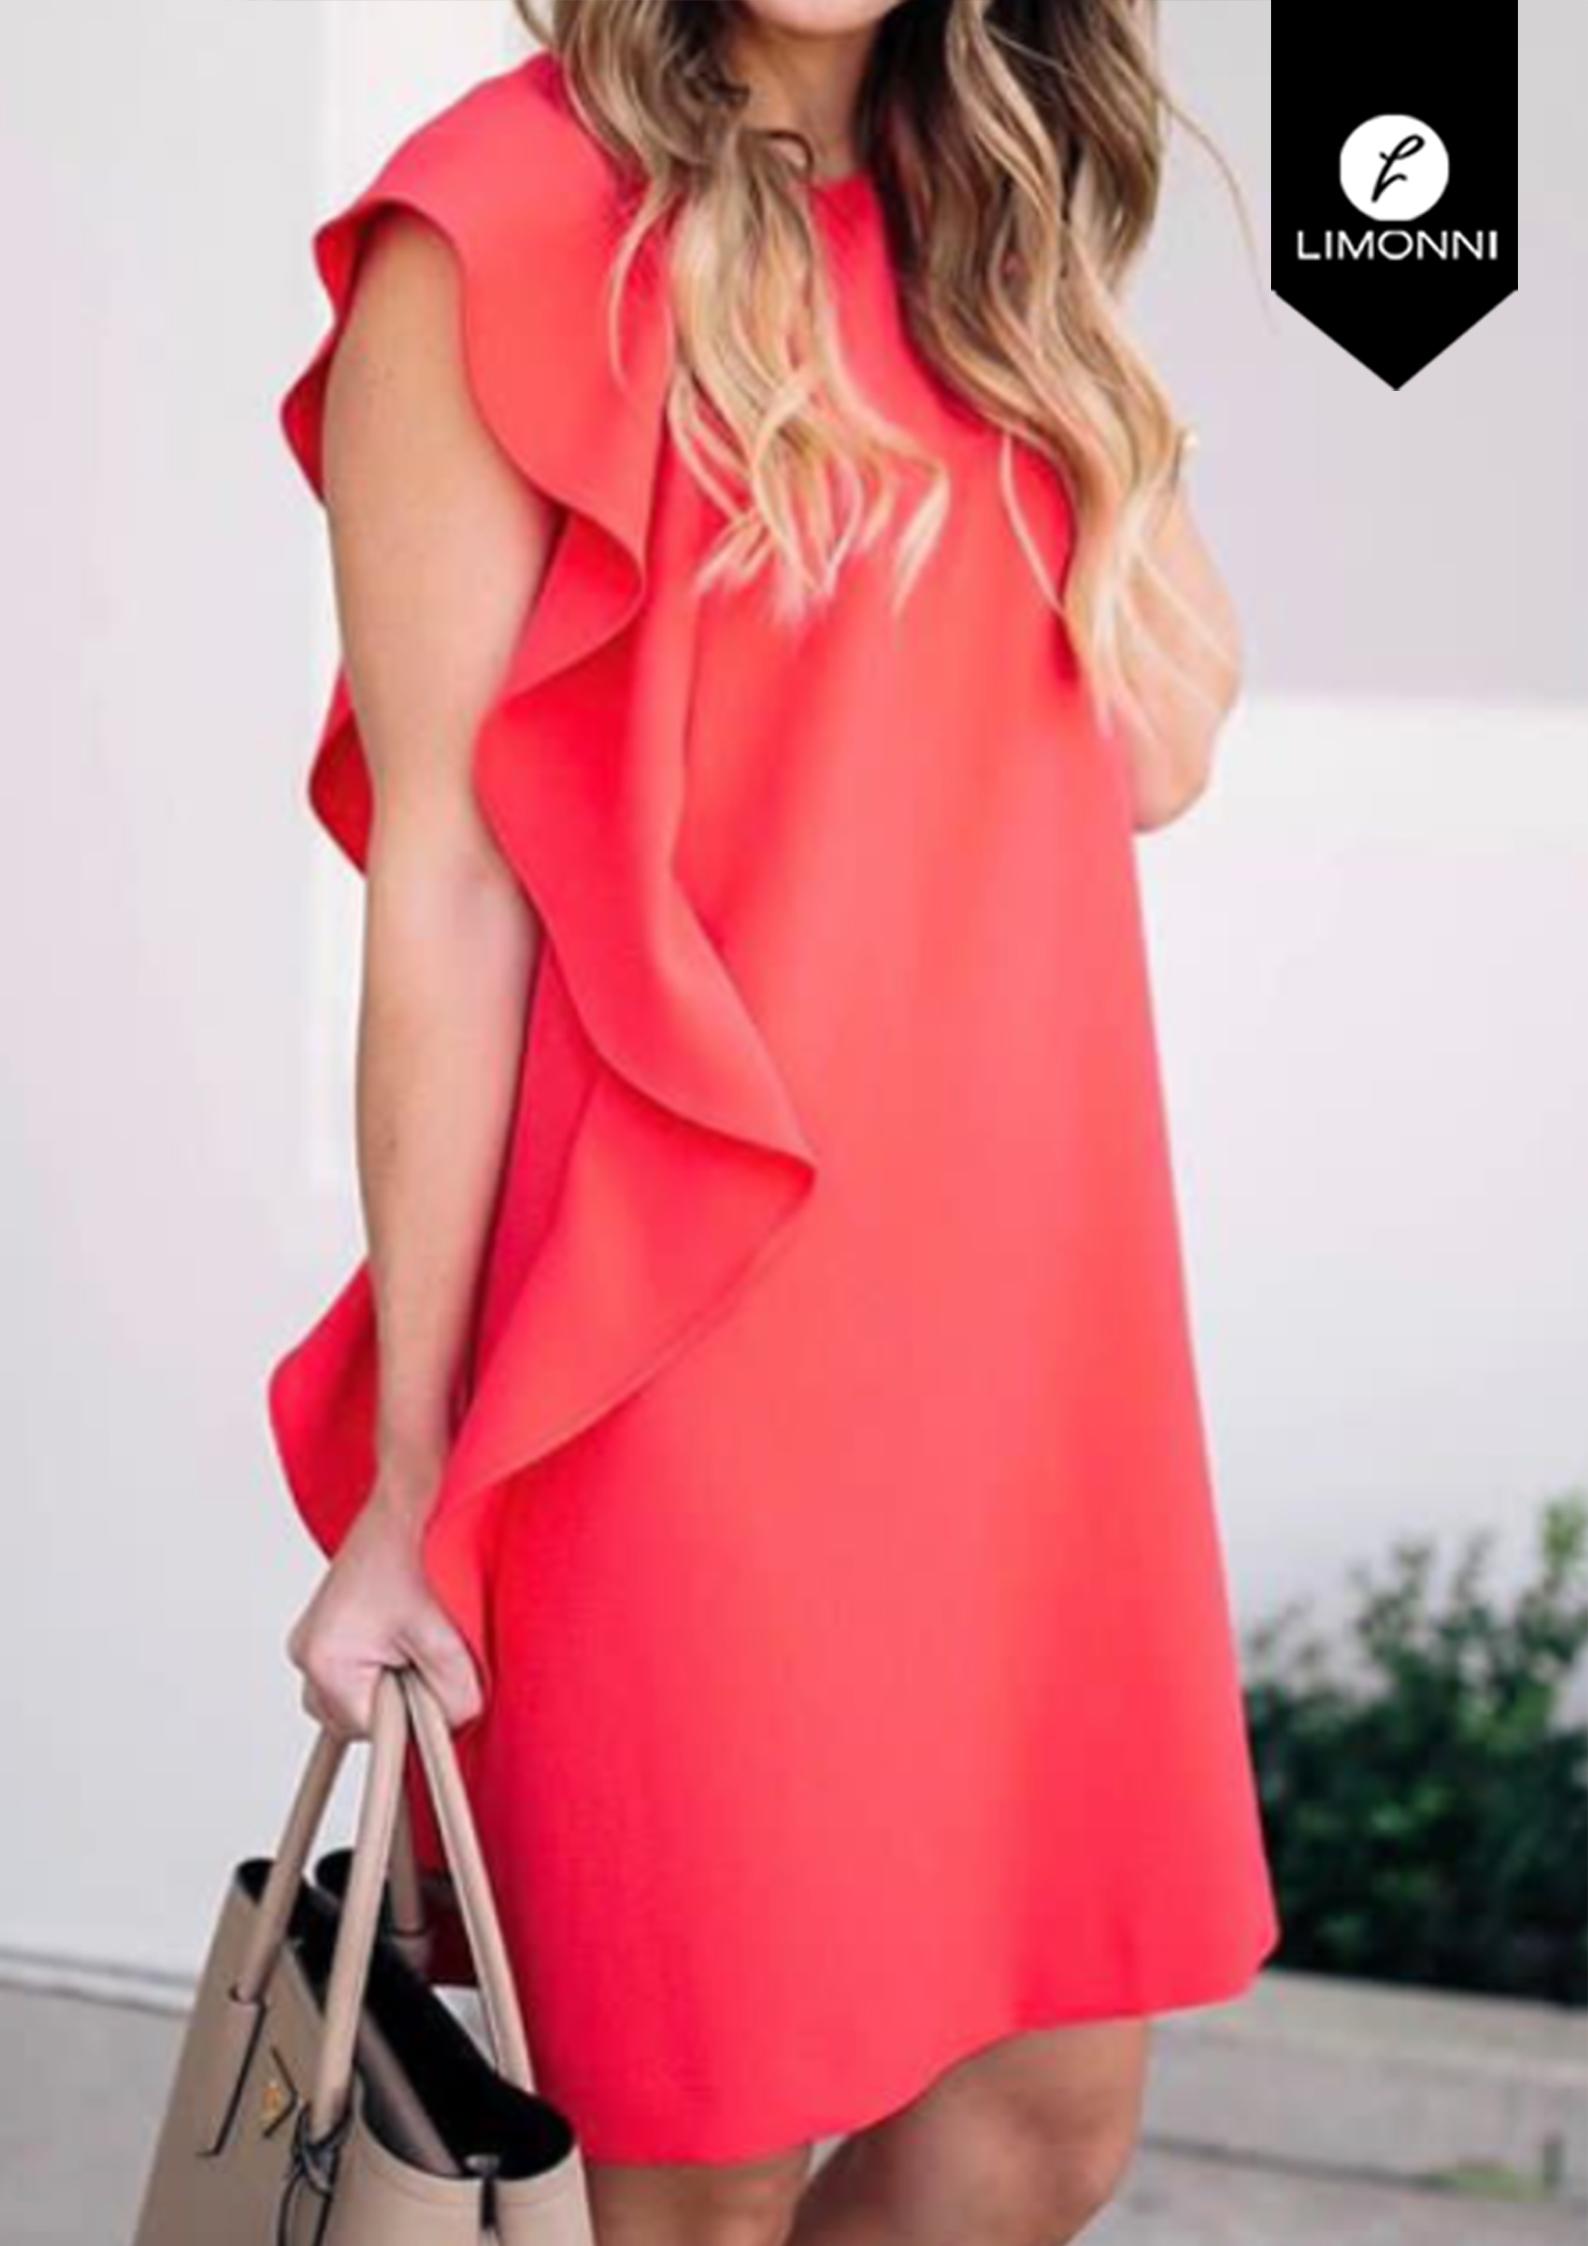 Vestidos para mujer Limonni Bennett LI1288 Cortos elegantes